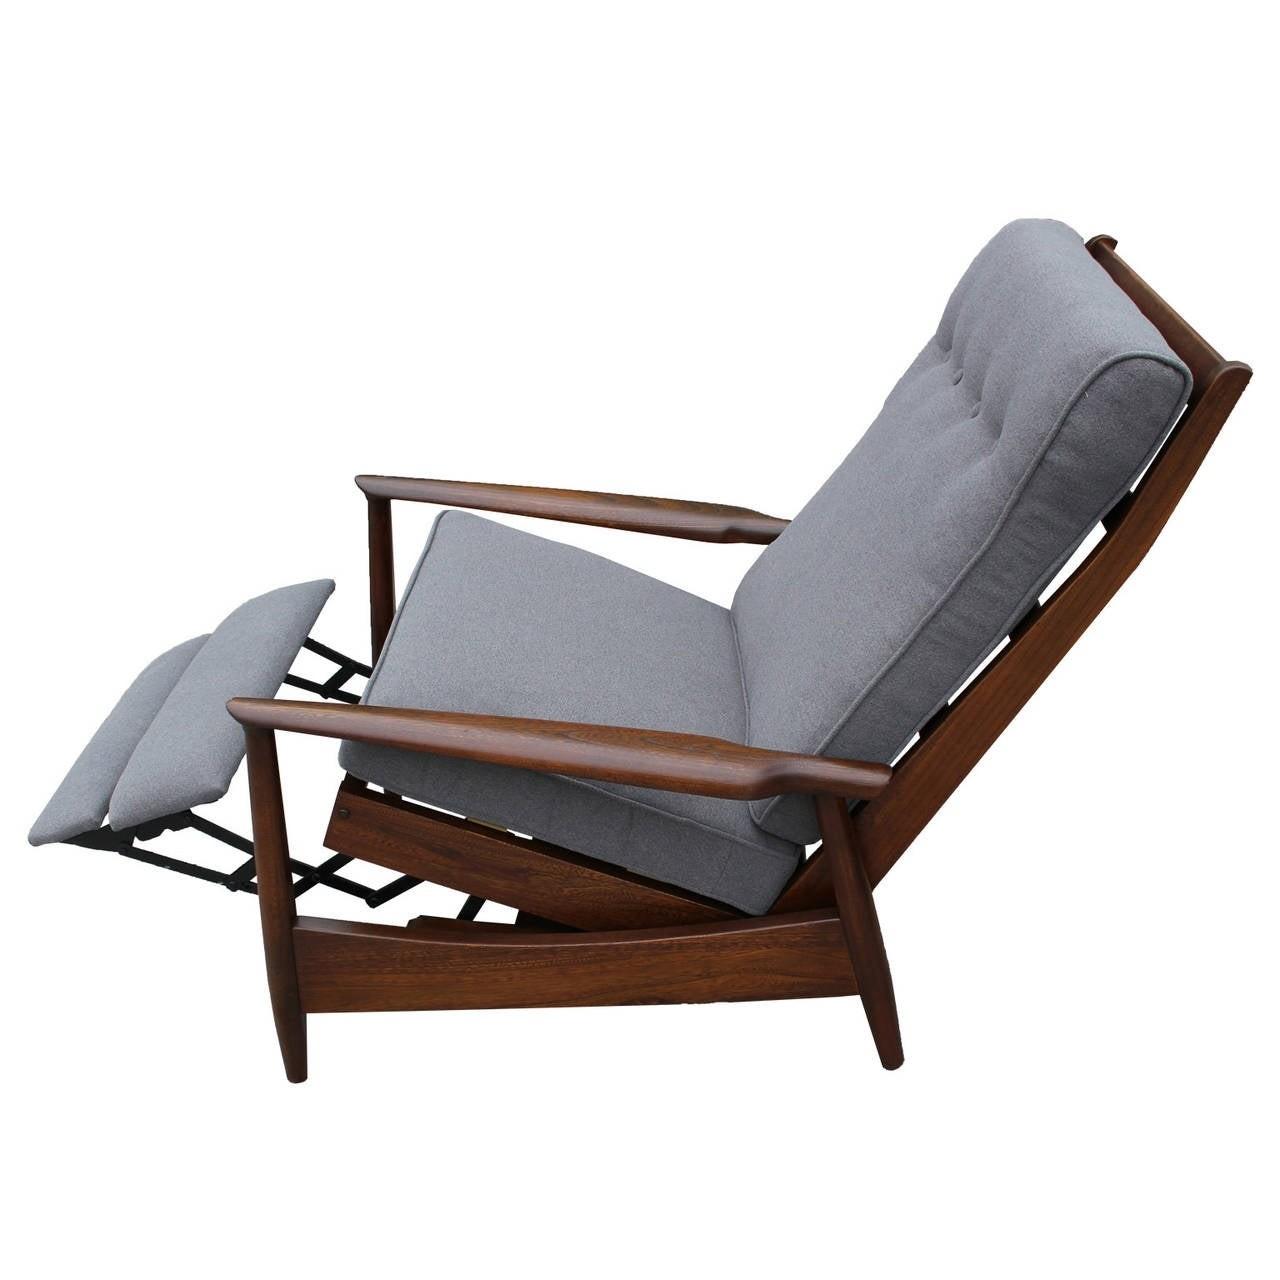 danish reclining sofa ekenasfiber johnhenriksson se u2022 rh ekenasfiber johnhenriksson se